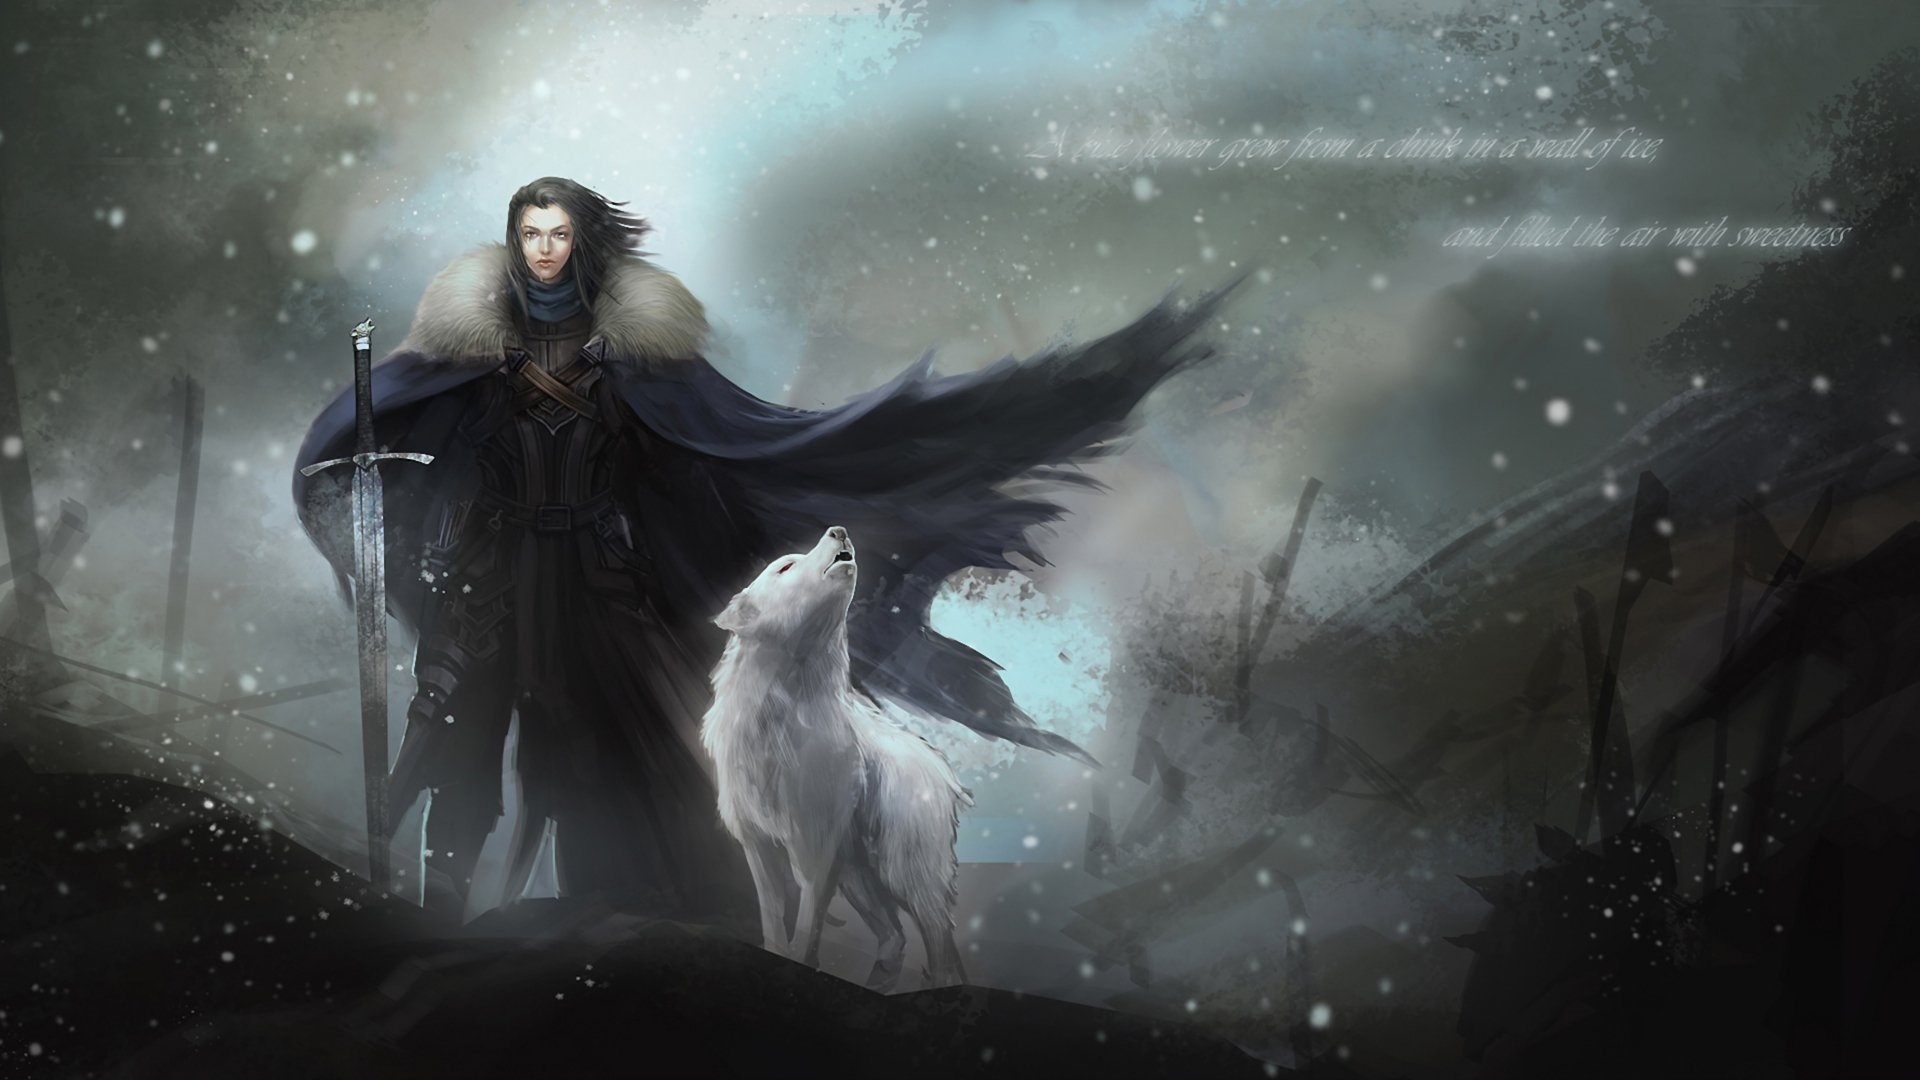 Game Of Thrones Wallpaper Sf Wallpaper